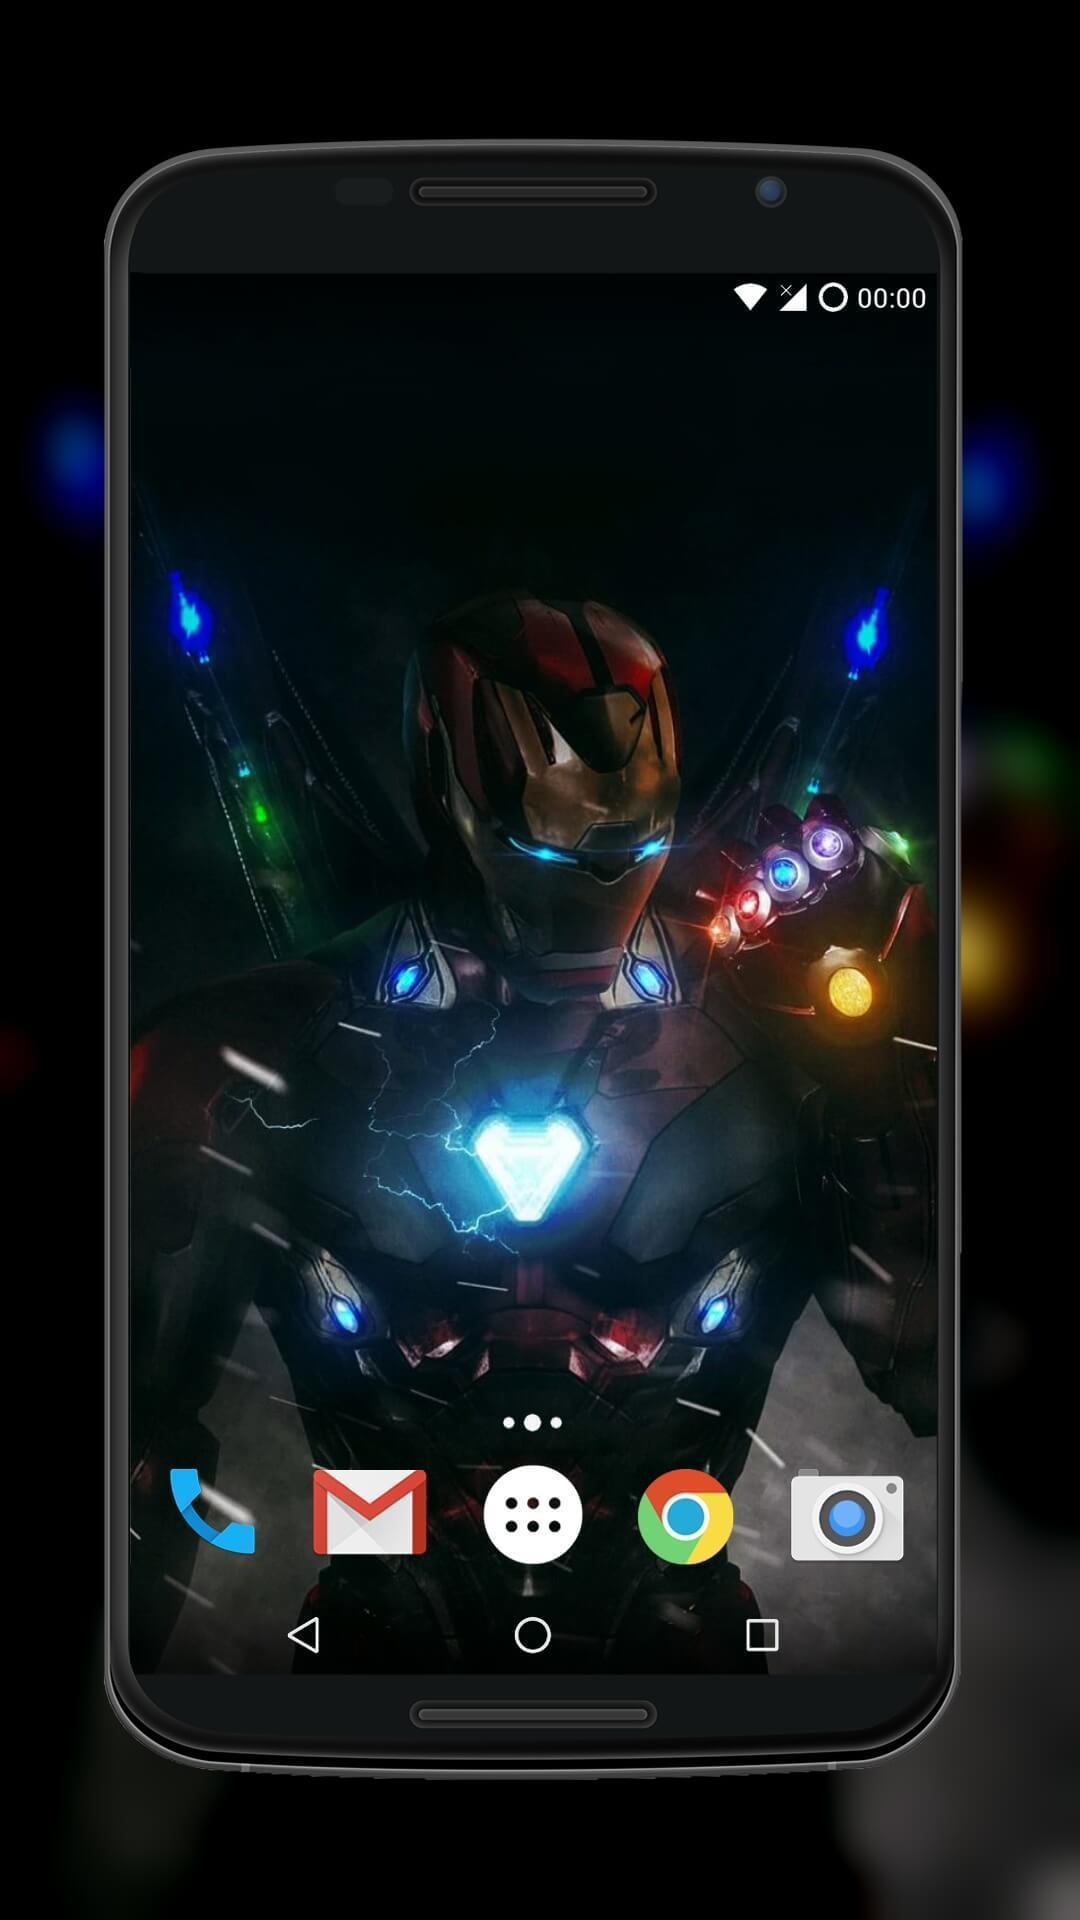 Avengers Endgame Wallpaper for Android - APK Download